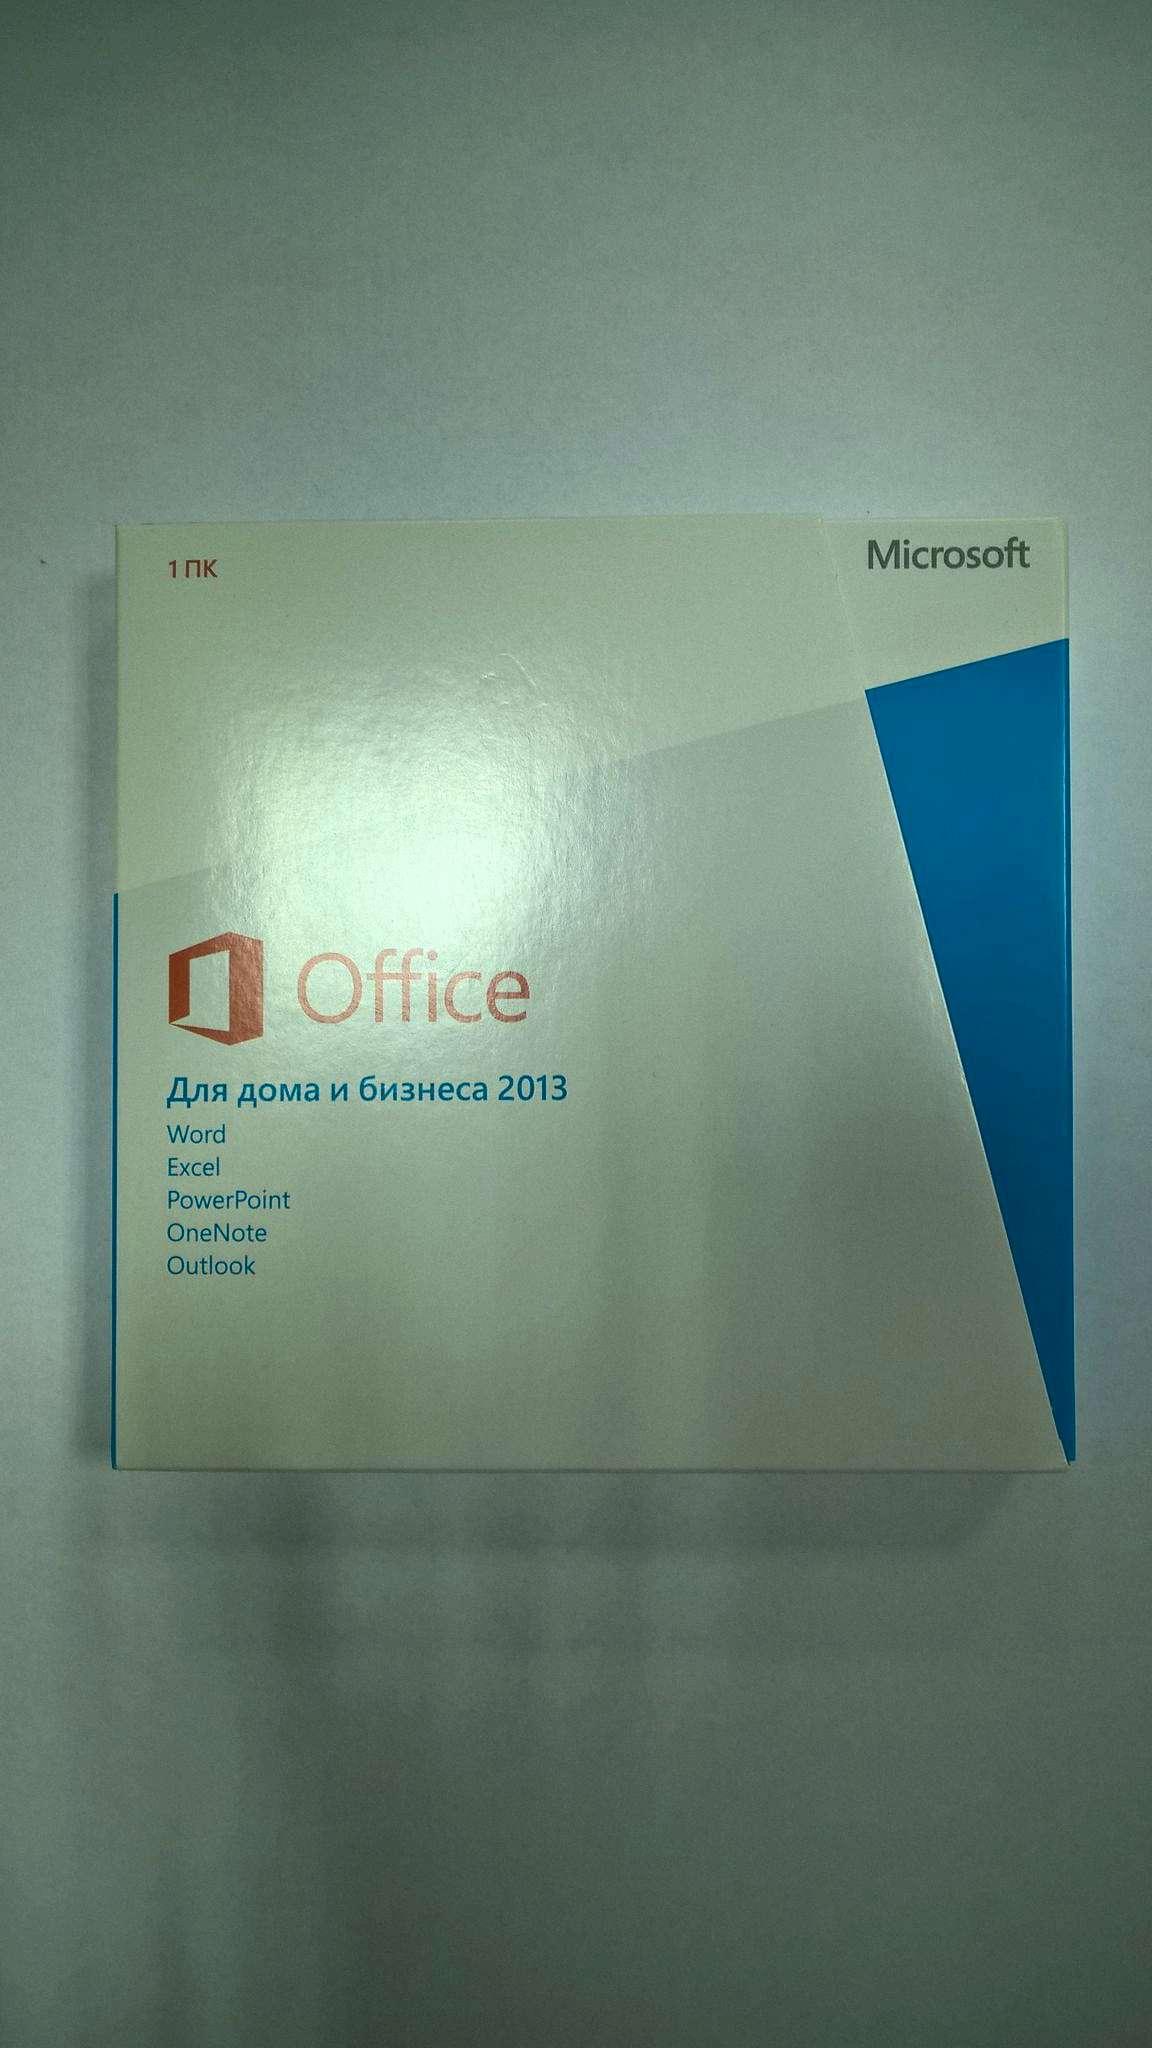 PowerPoint 2007  Microsoft Office от 2003 до 2013